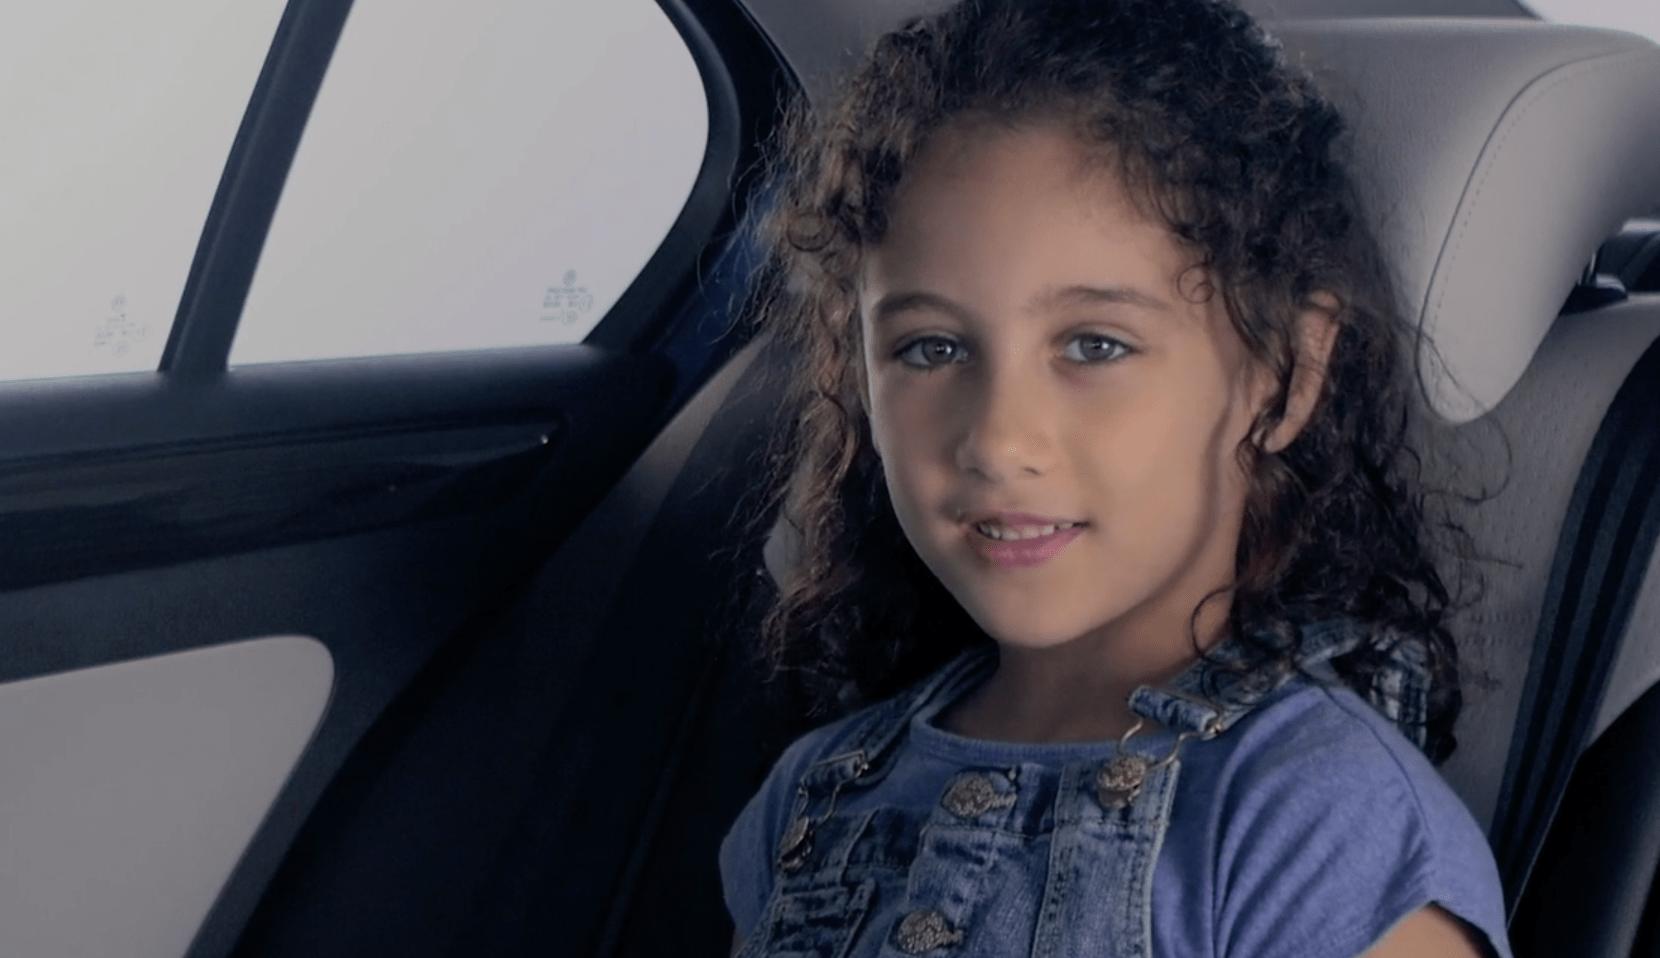 Video & Film Production Dubai - UAE - image Screen-Shot-2021-03-15-at-5.01.26-PM on https://www.kalideme.com